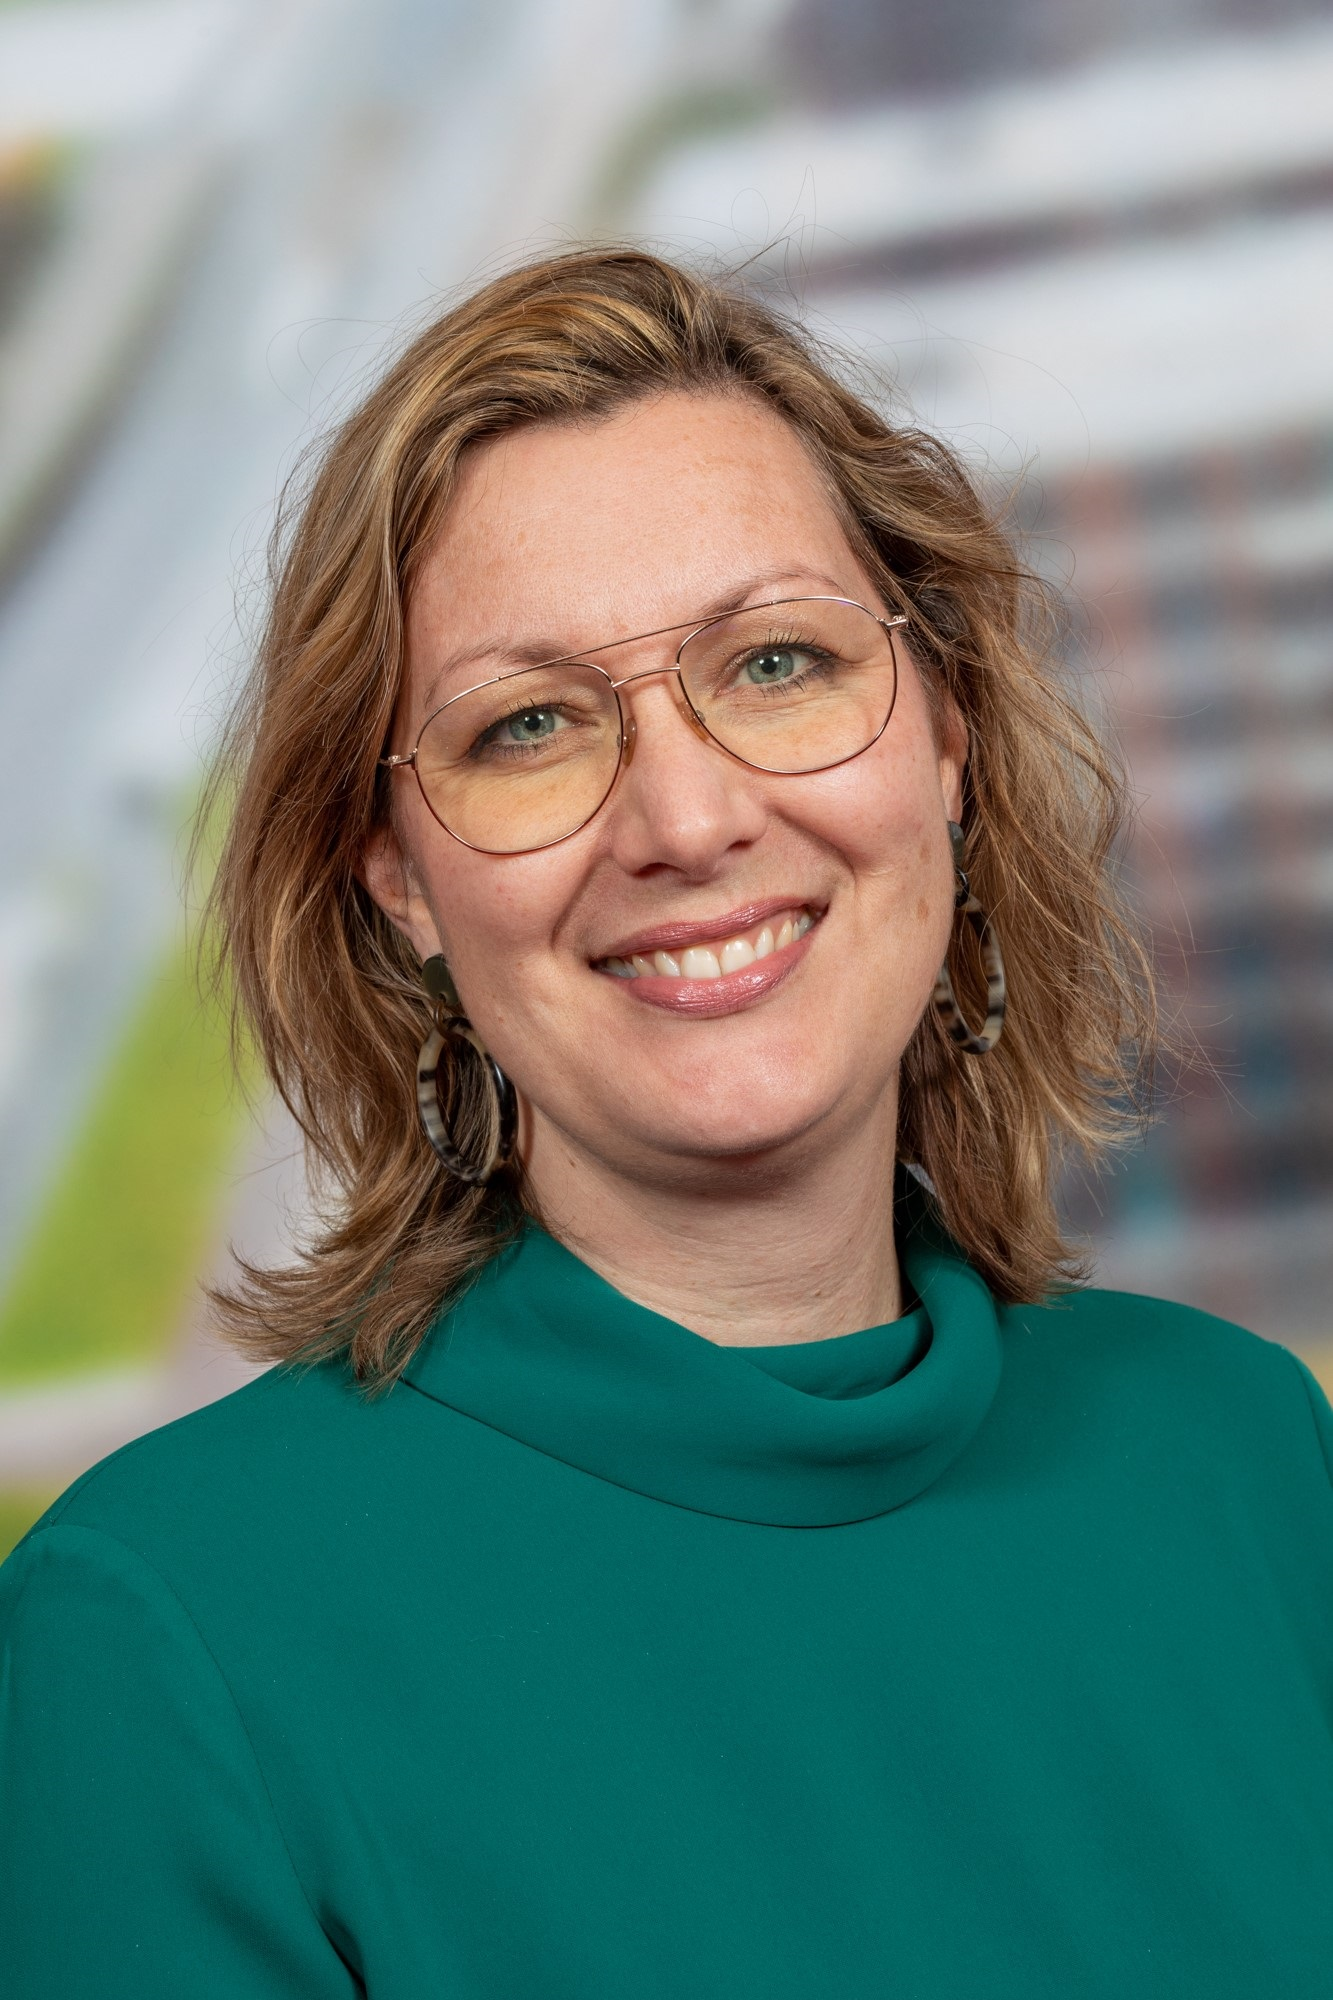 Carola Bodenstaff